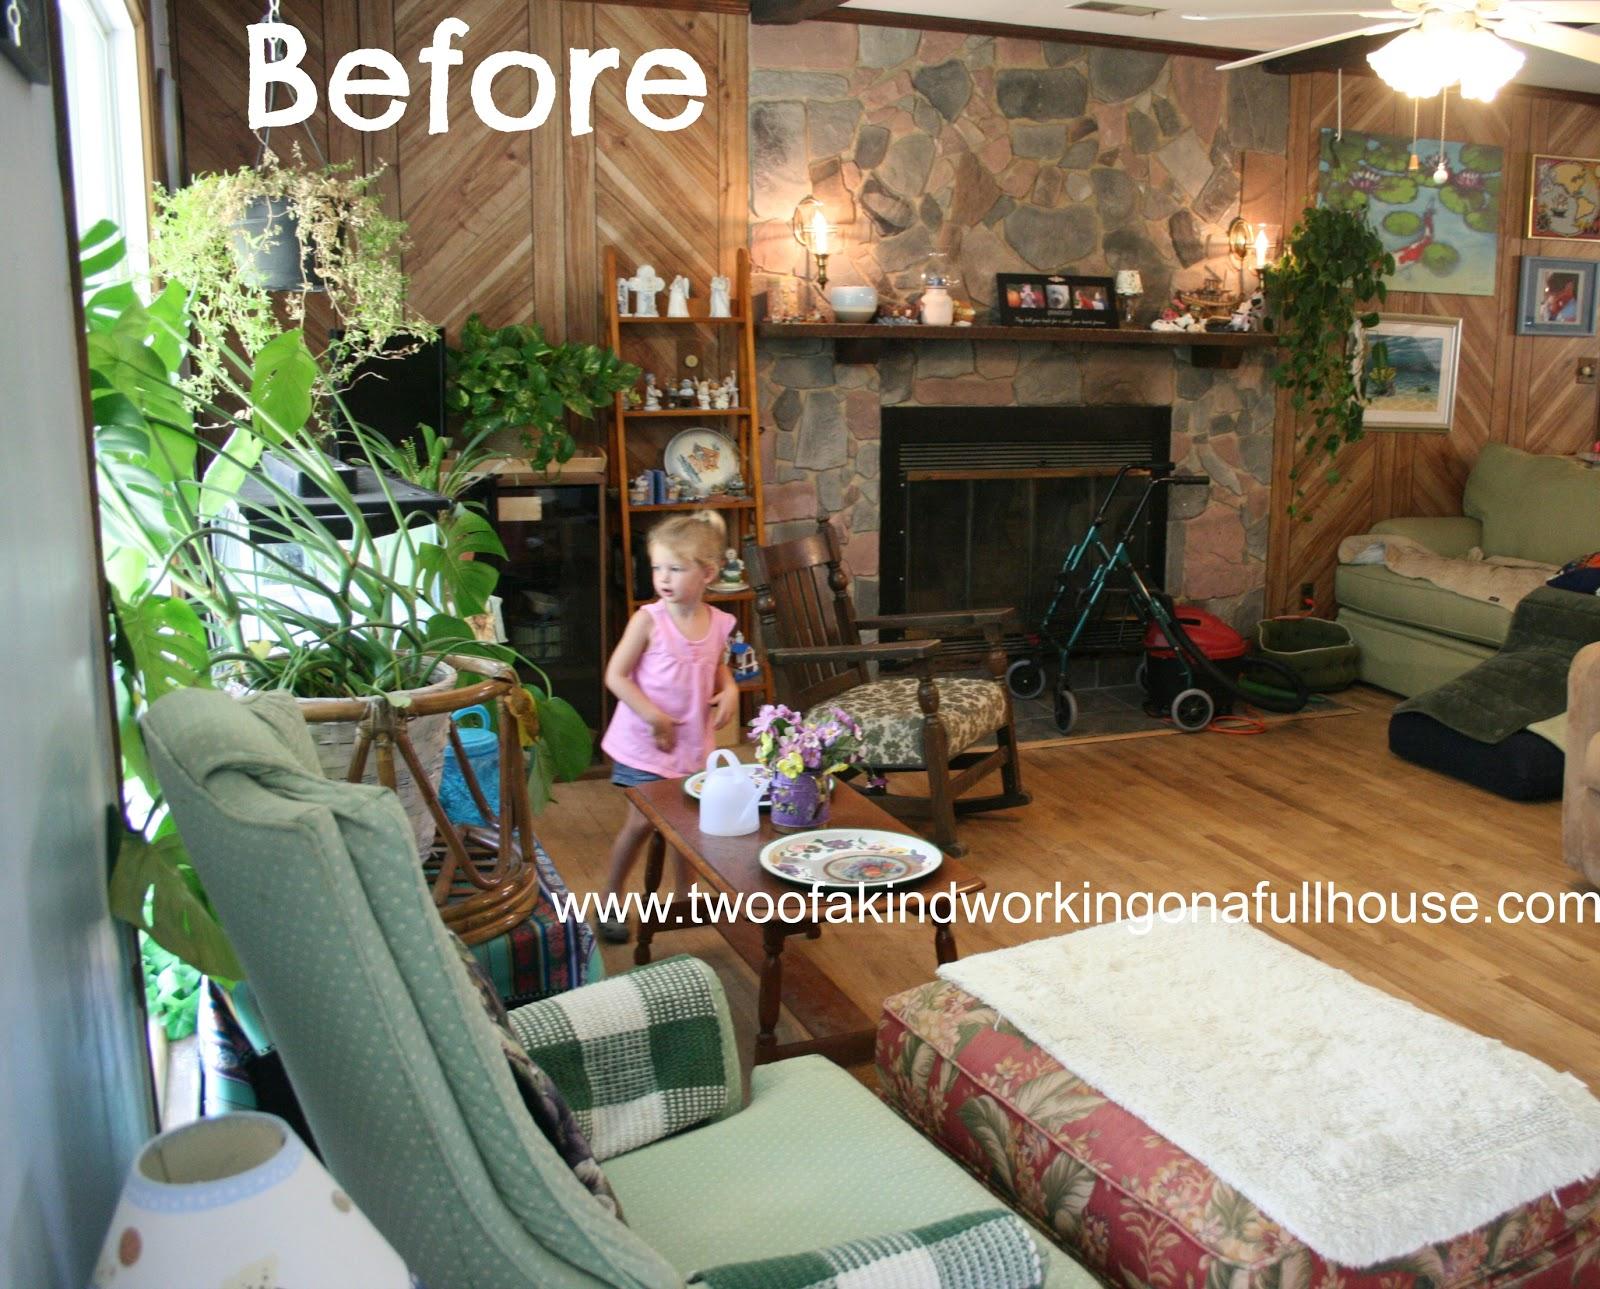 ... Kitchen Rugs For Hardwood Floors . Mohawk Home Area Rug Giveaway